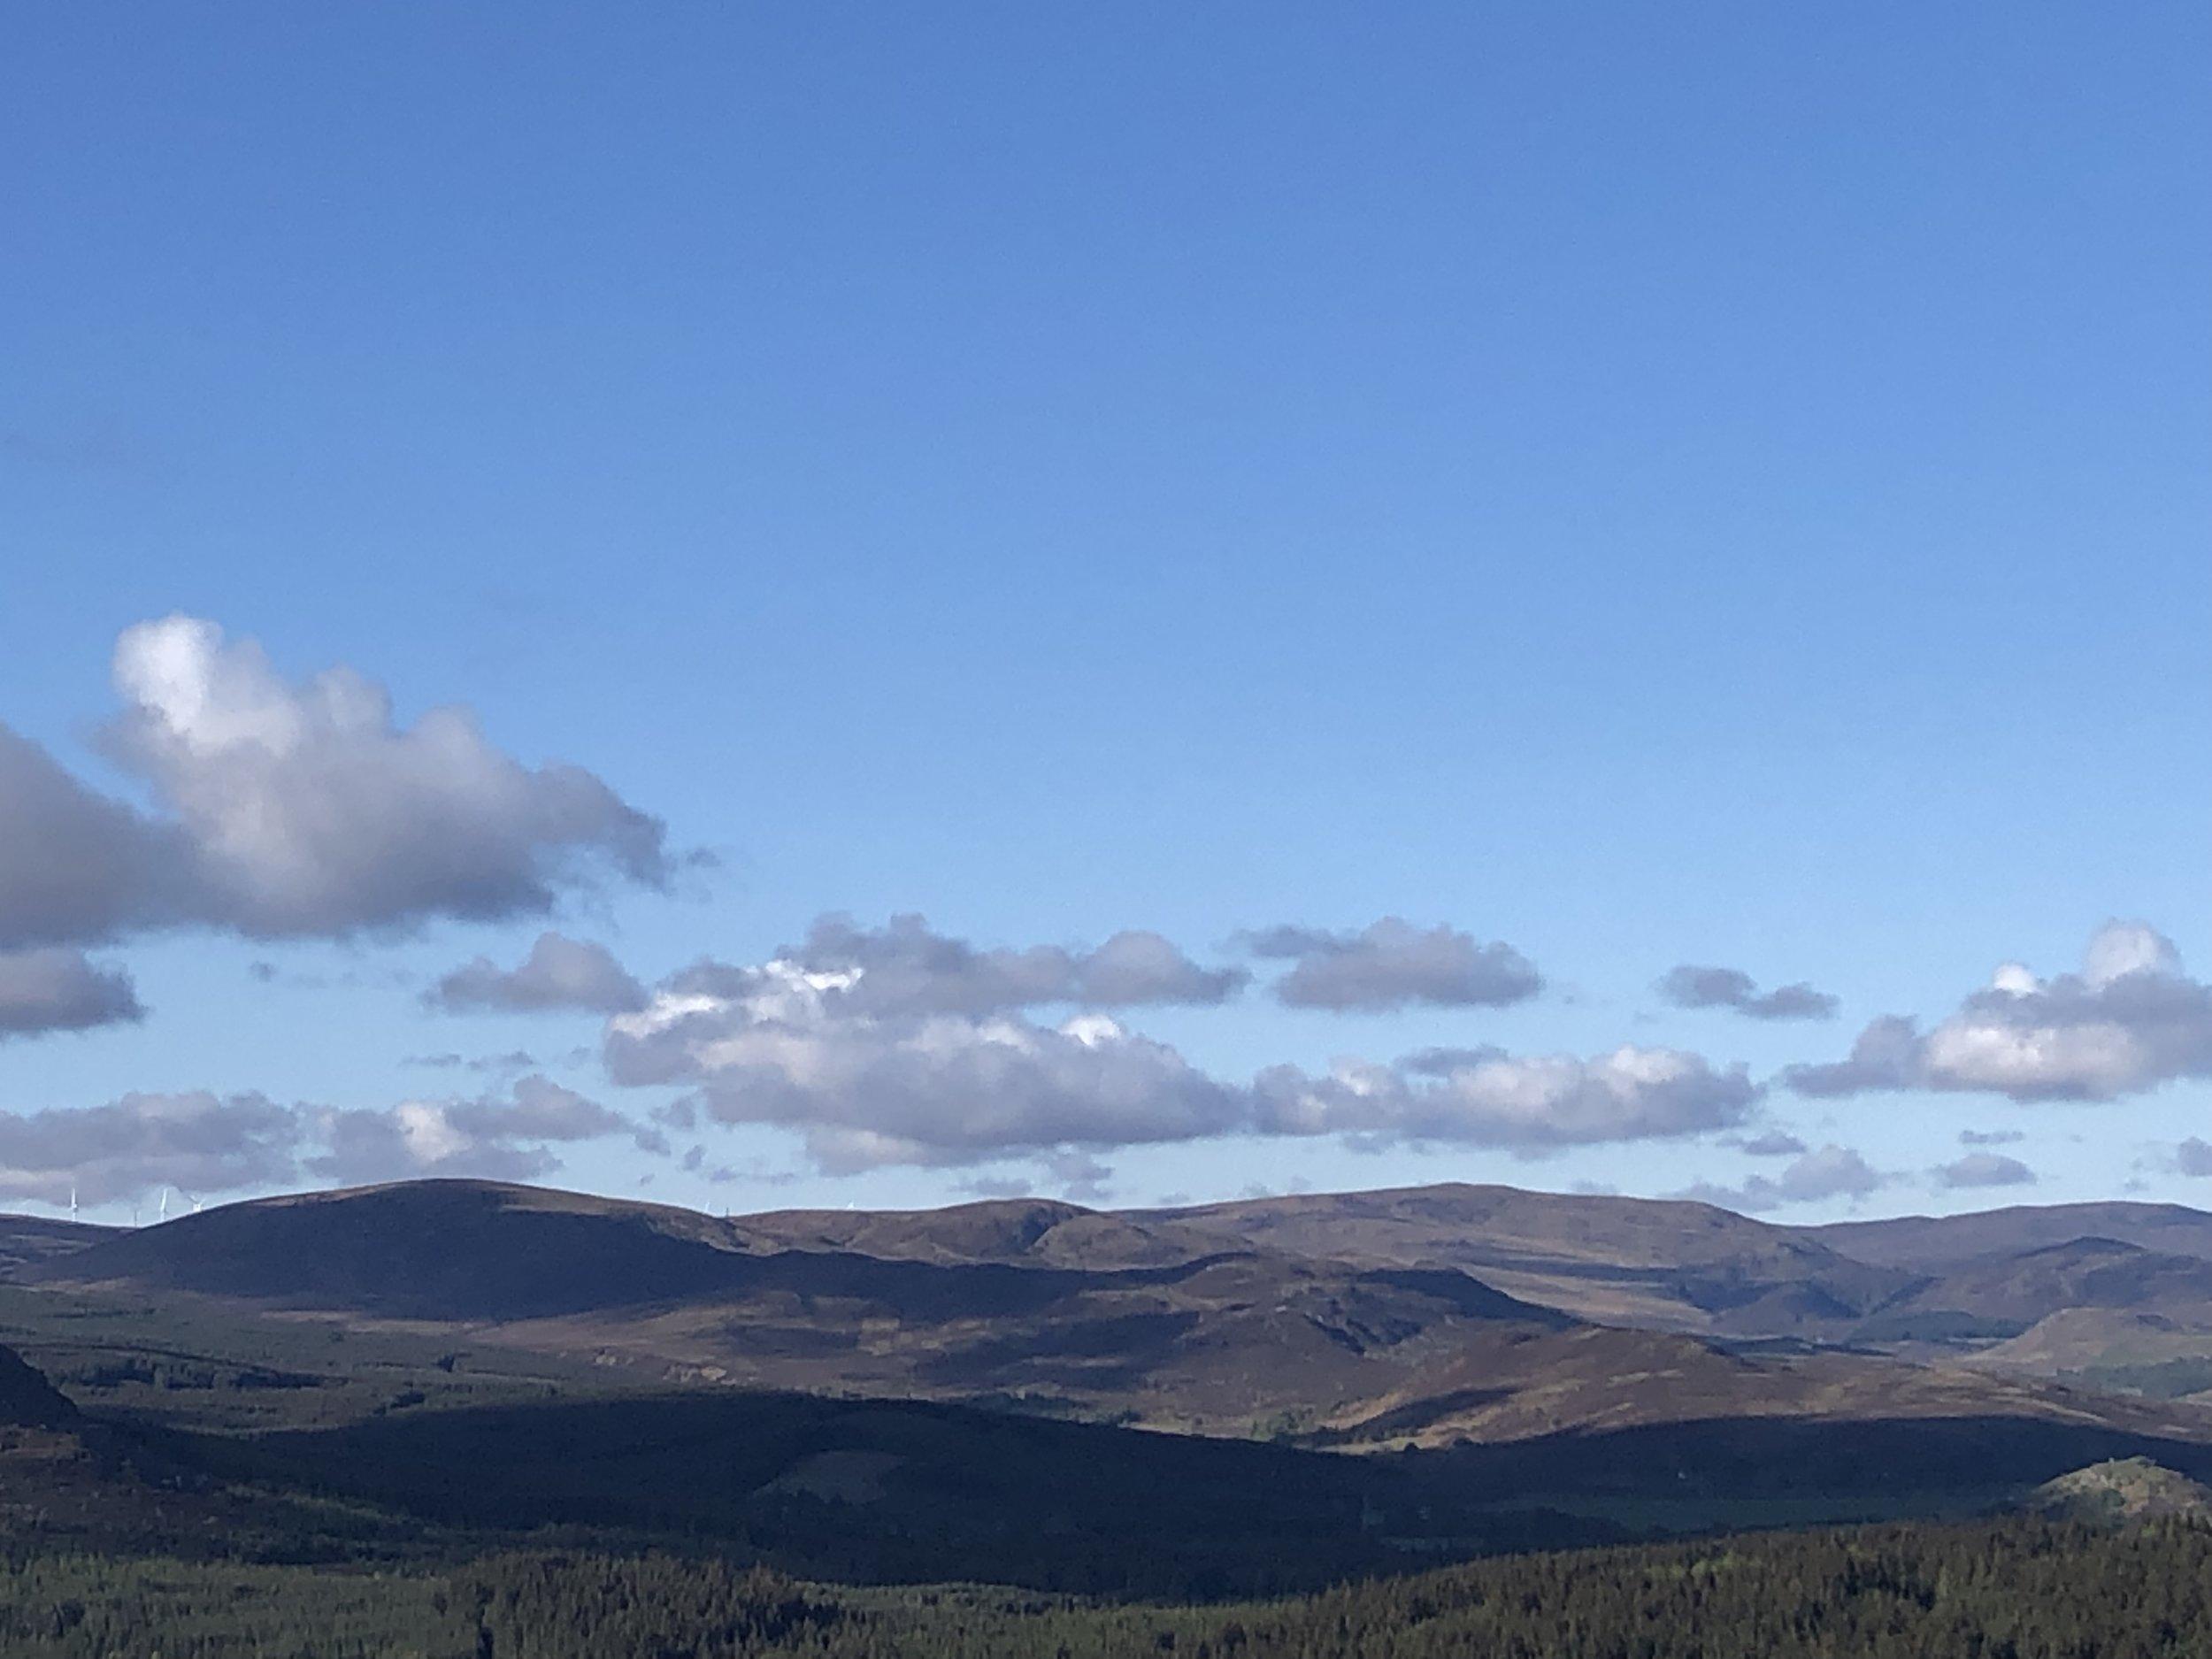 Looking South from Creag an Dubhair / creag an tuathan towards the Monadh Liath